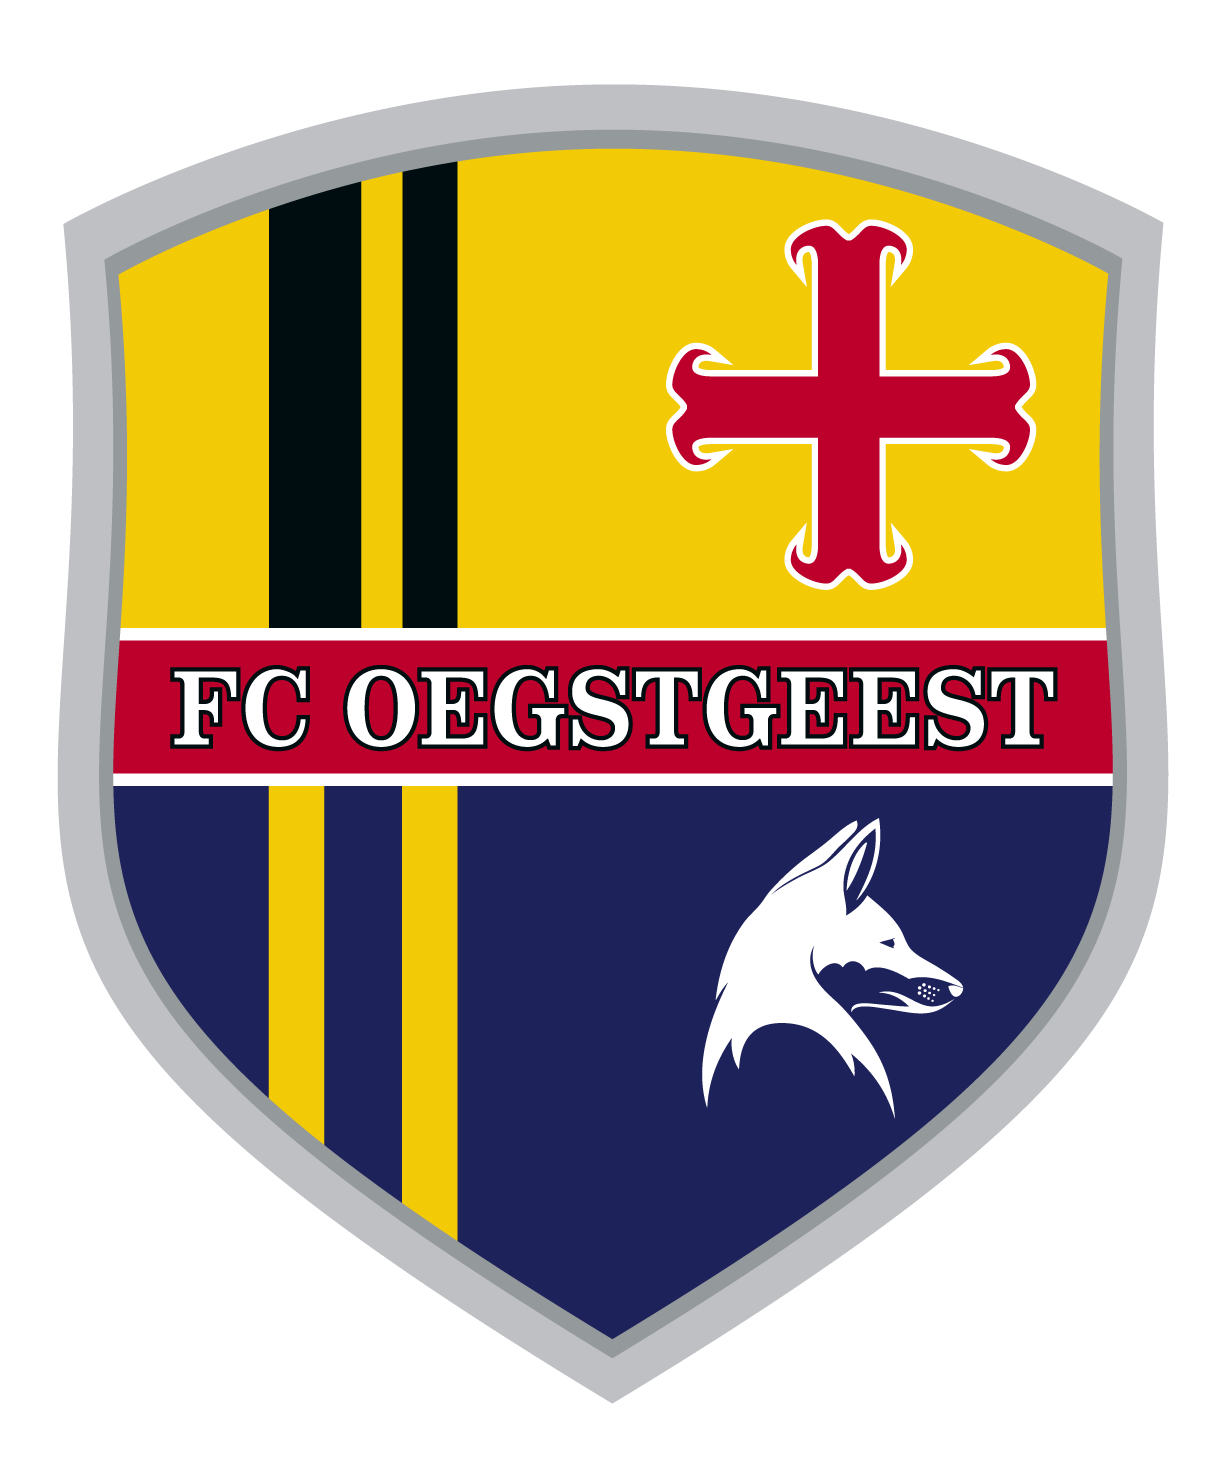 Opening sportpark FC Oegstgeest